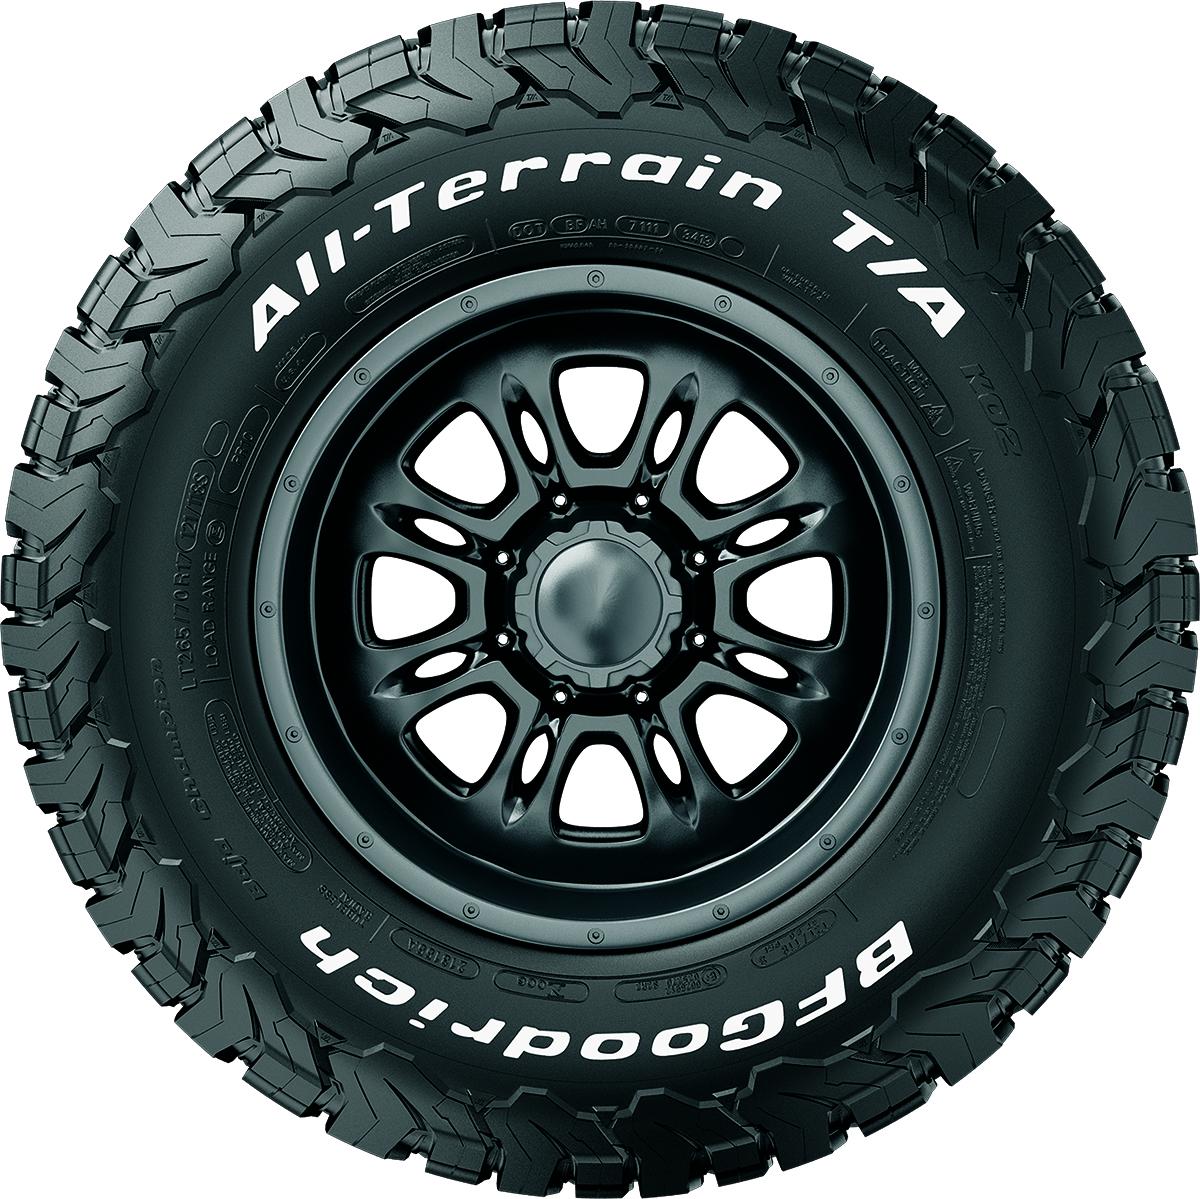 Bfgoodrich All Terrain >> BFGoodrich® Tires vuelve al Dakar - Michelin espacio prensa